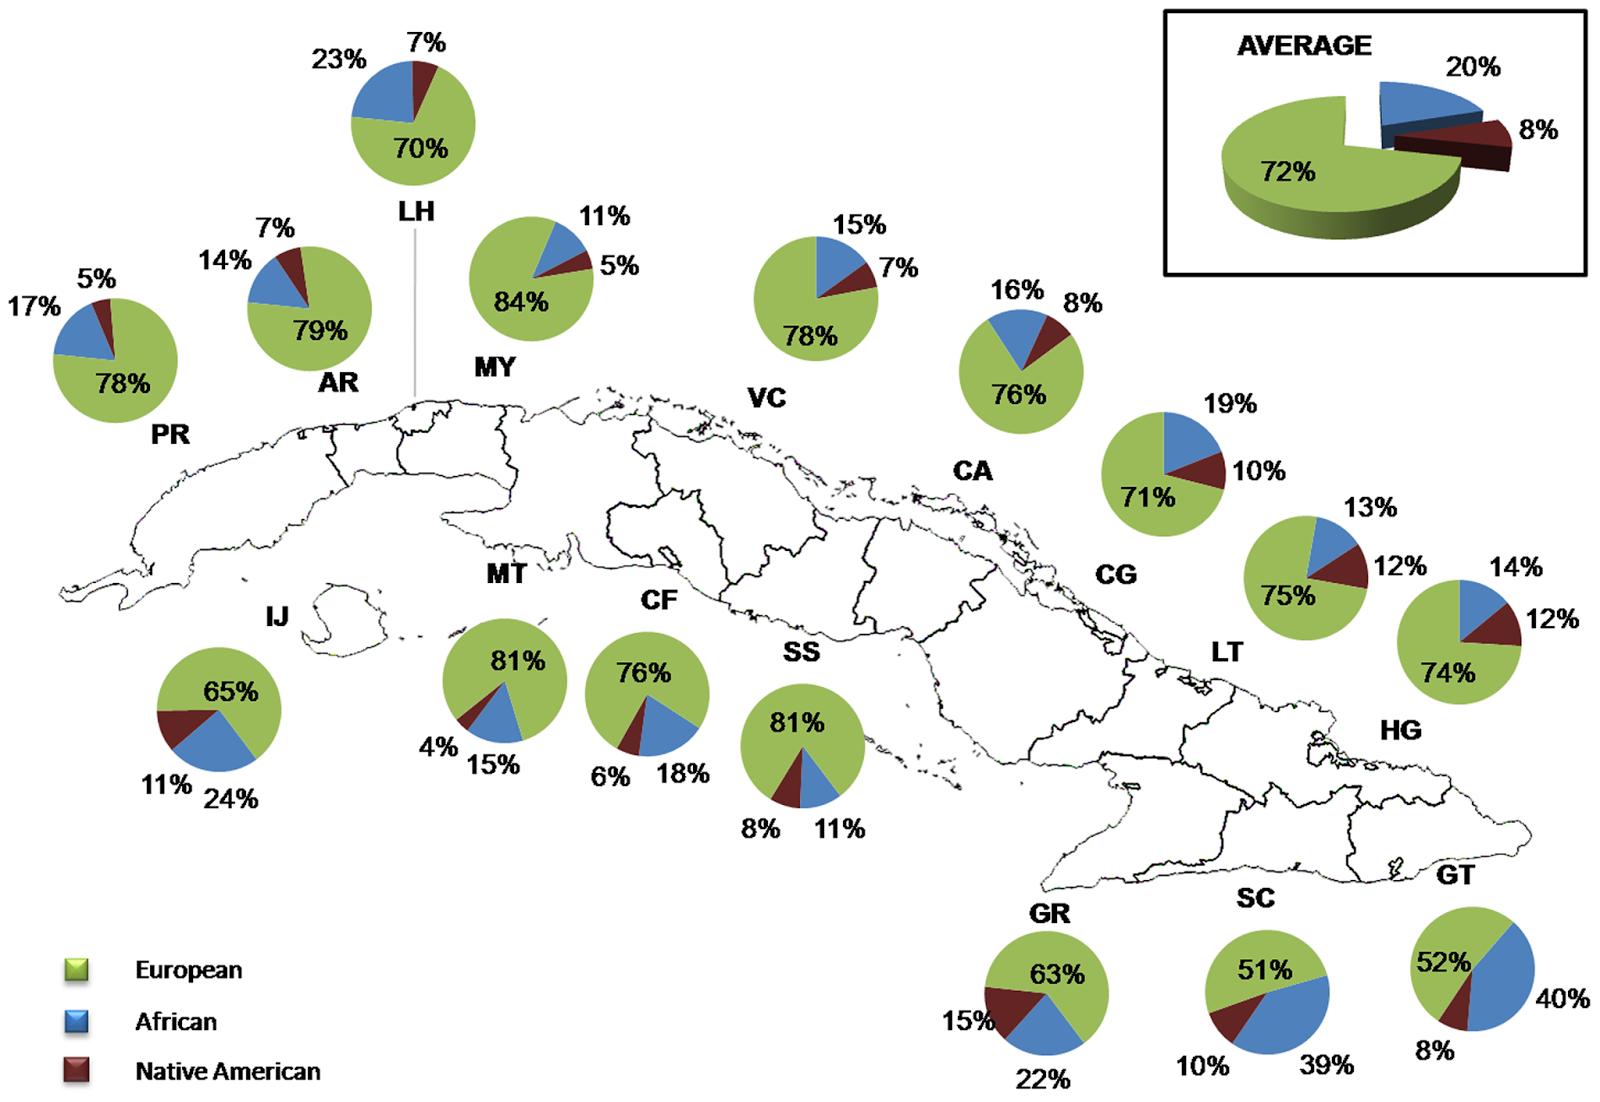 Diferentes fenotipos y grupos étnicos de Latinoamérica - Página 4 AOuTMl